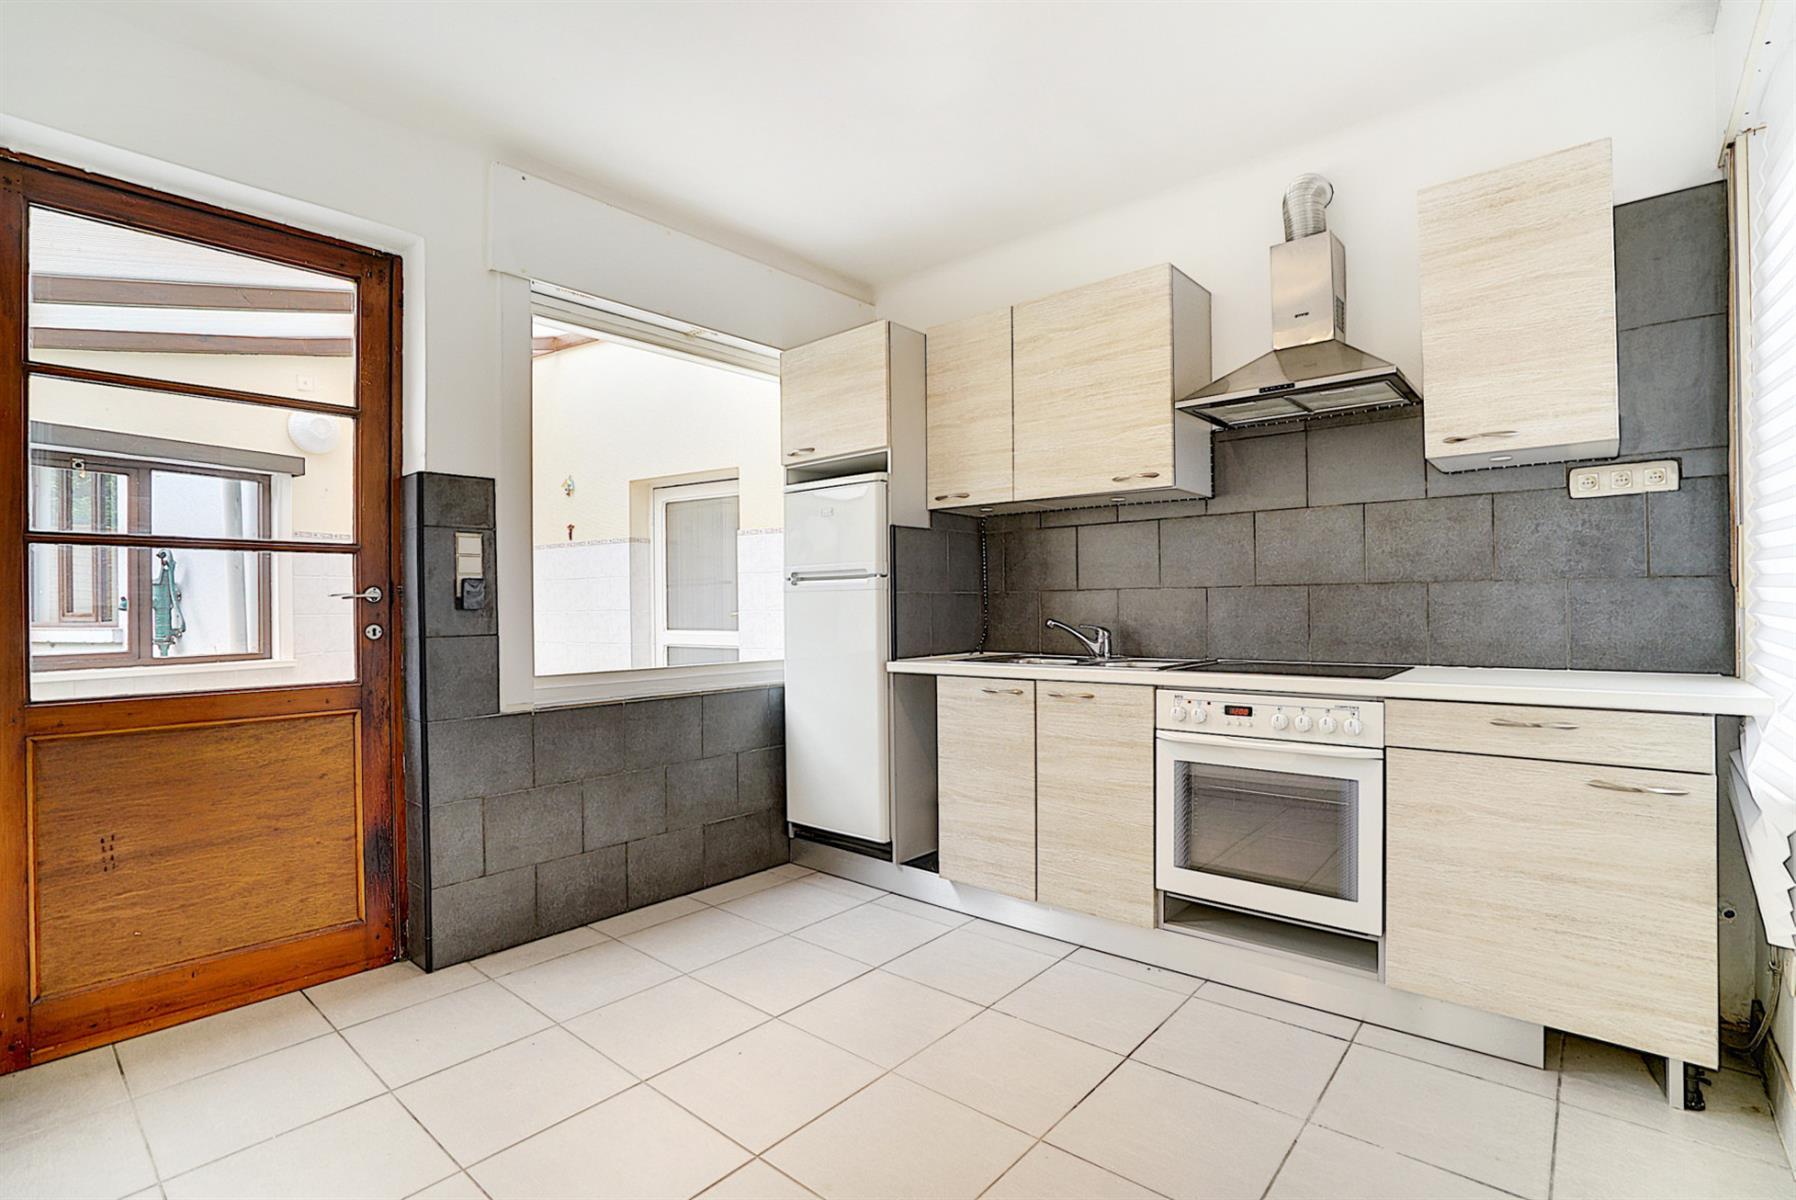 Maison - Ottignies-Louvain-la-Neuve - #3849240-3